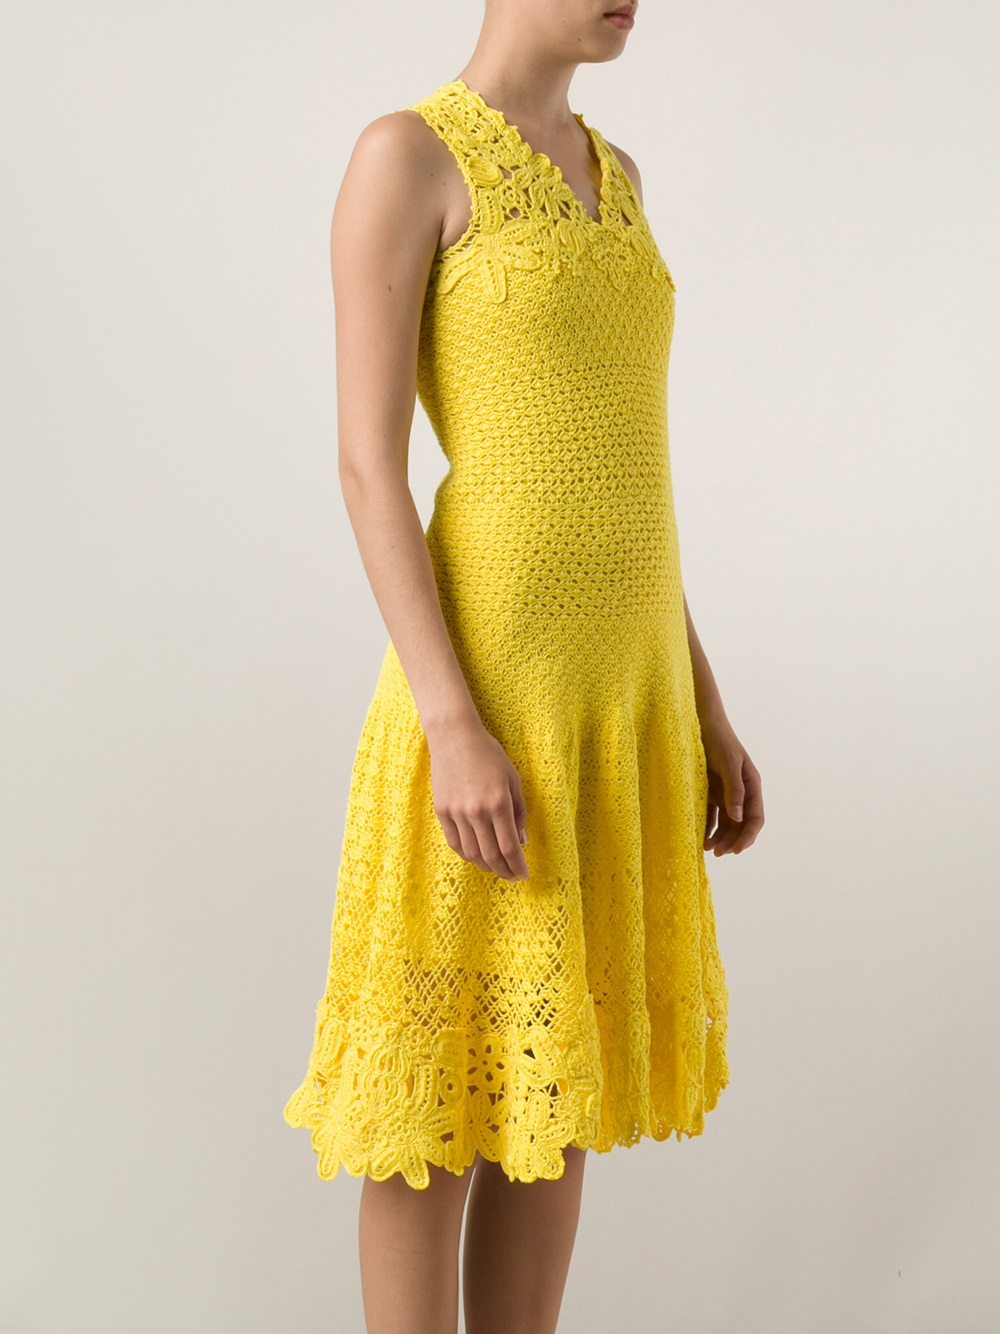 lyst oscar de la renta crochet dress in yellow. Black Bedroom Furniture Sets. Home Design Ideas